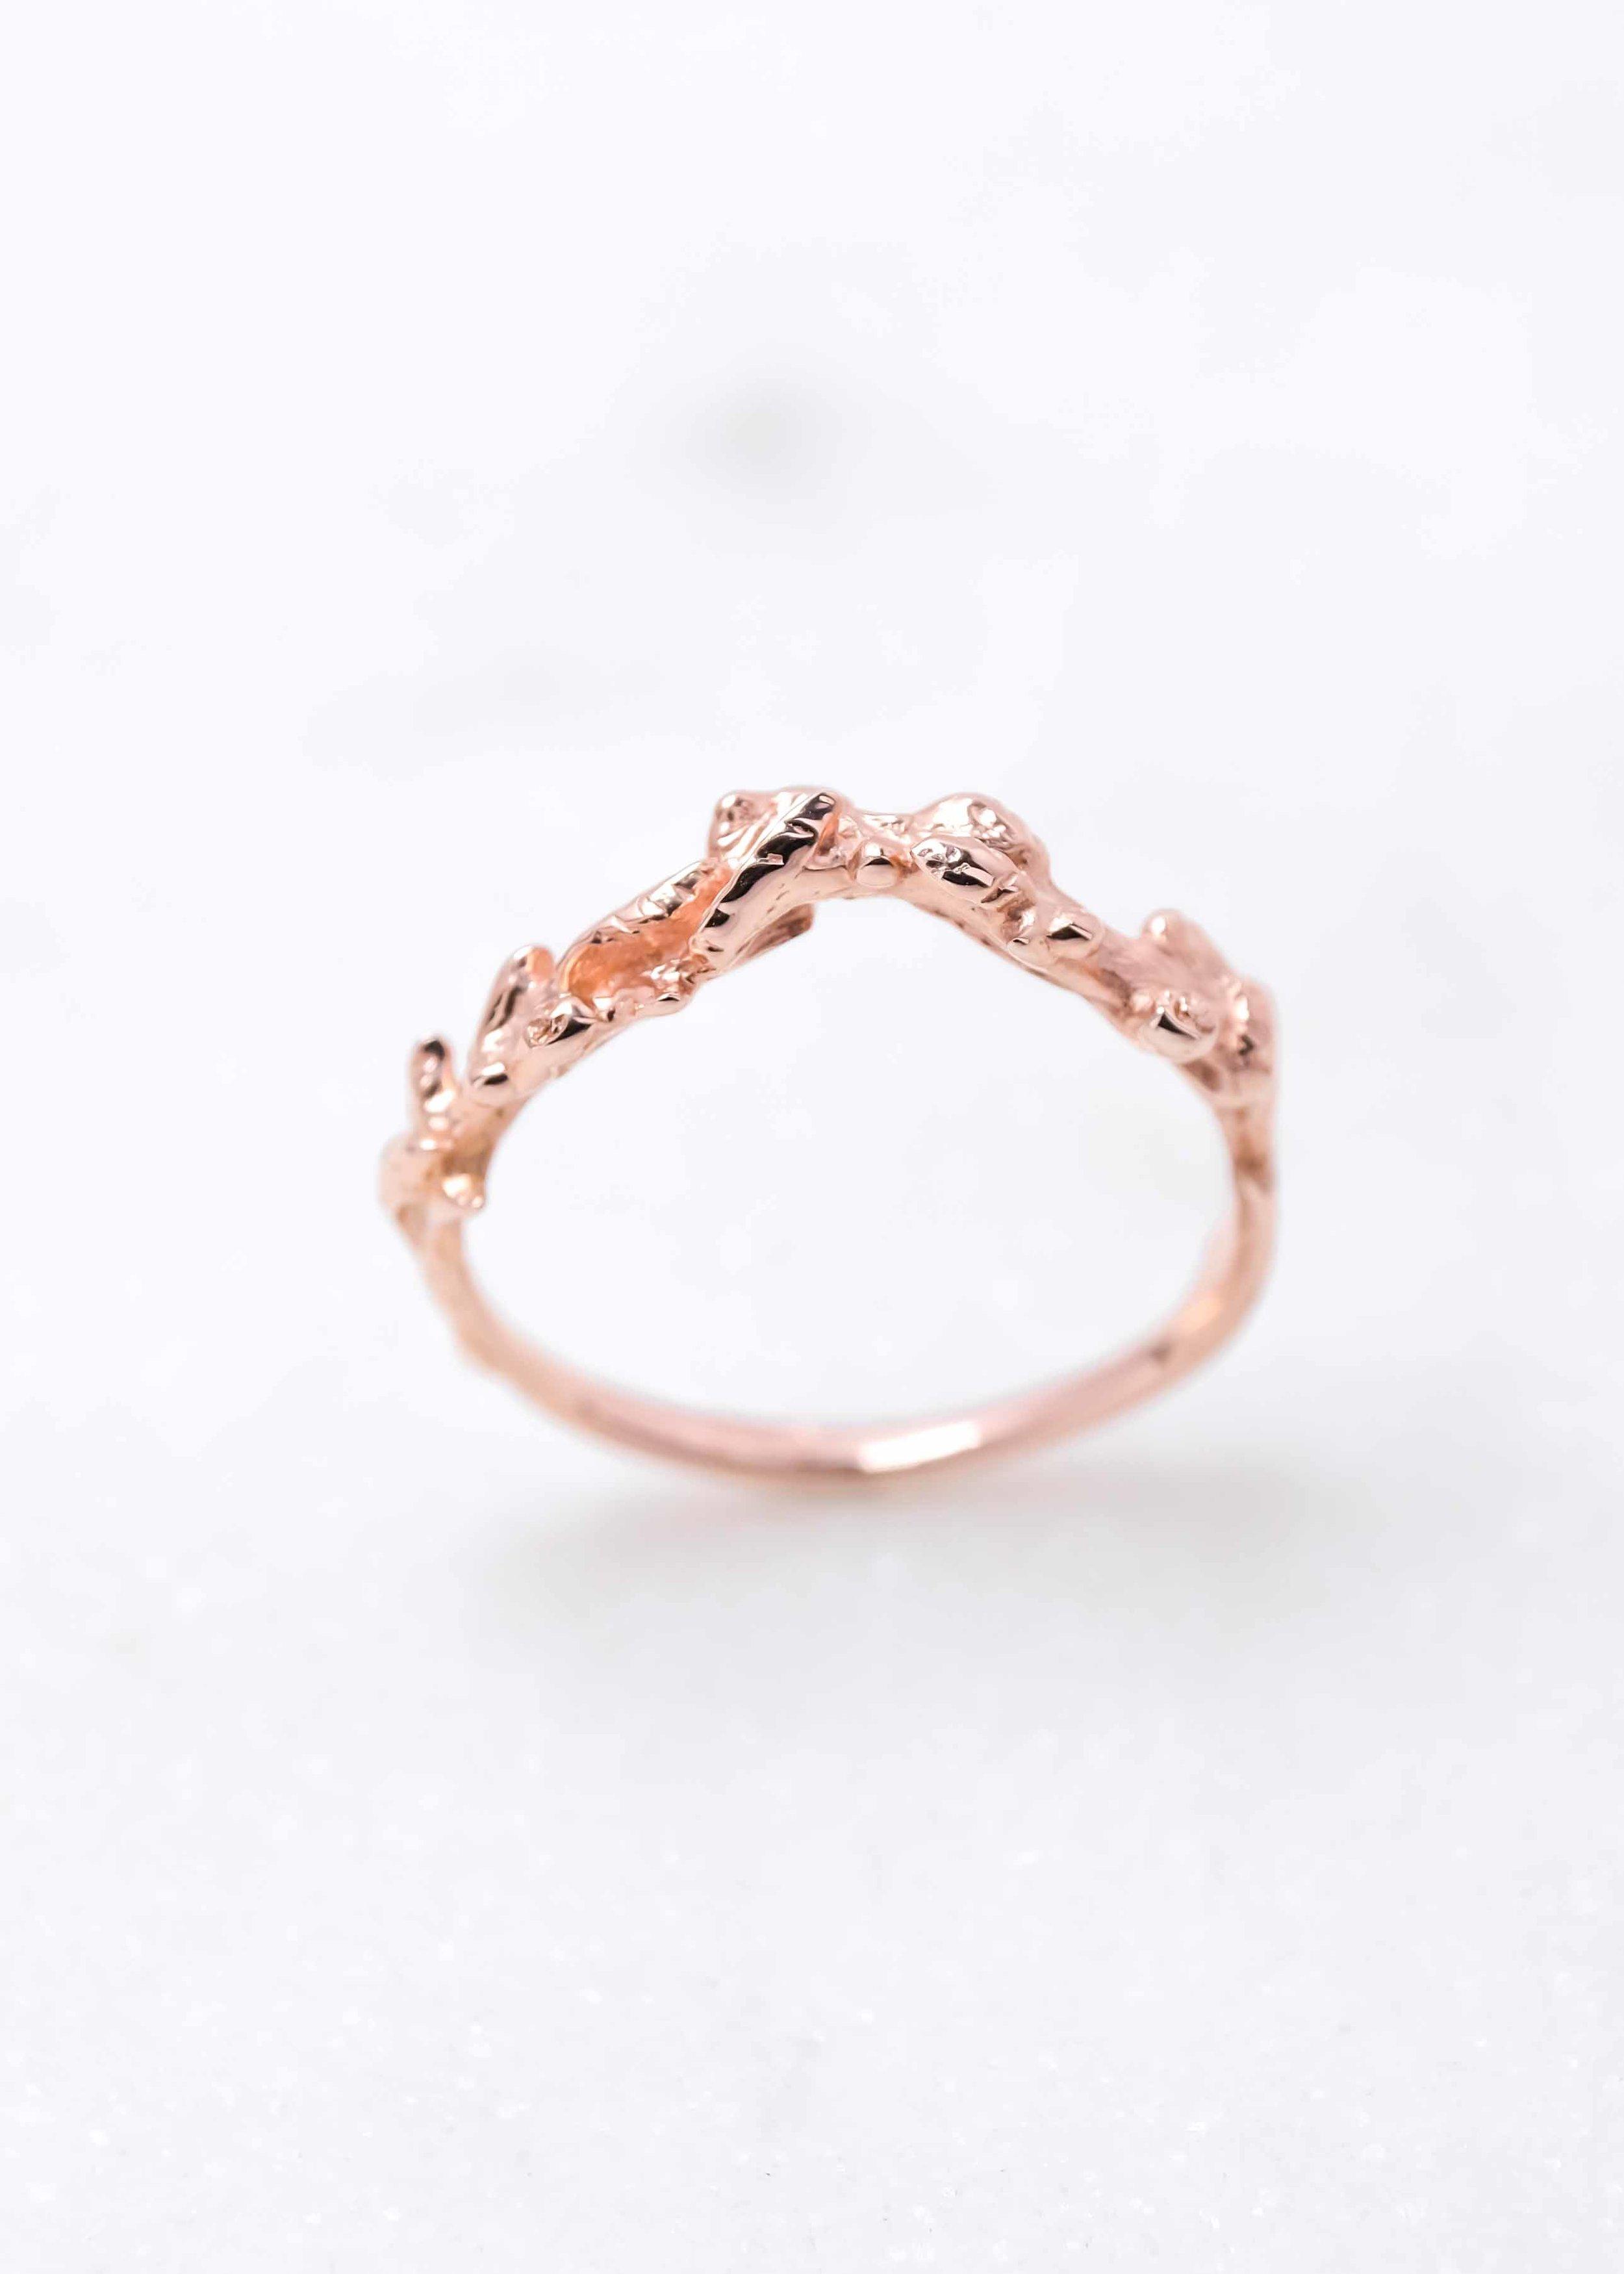 women-wedding-ring-custom-sur-mesure-alliances-the-black-alchemy-6